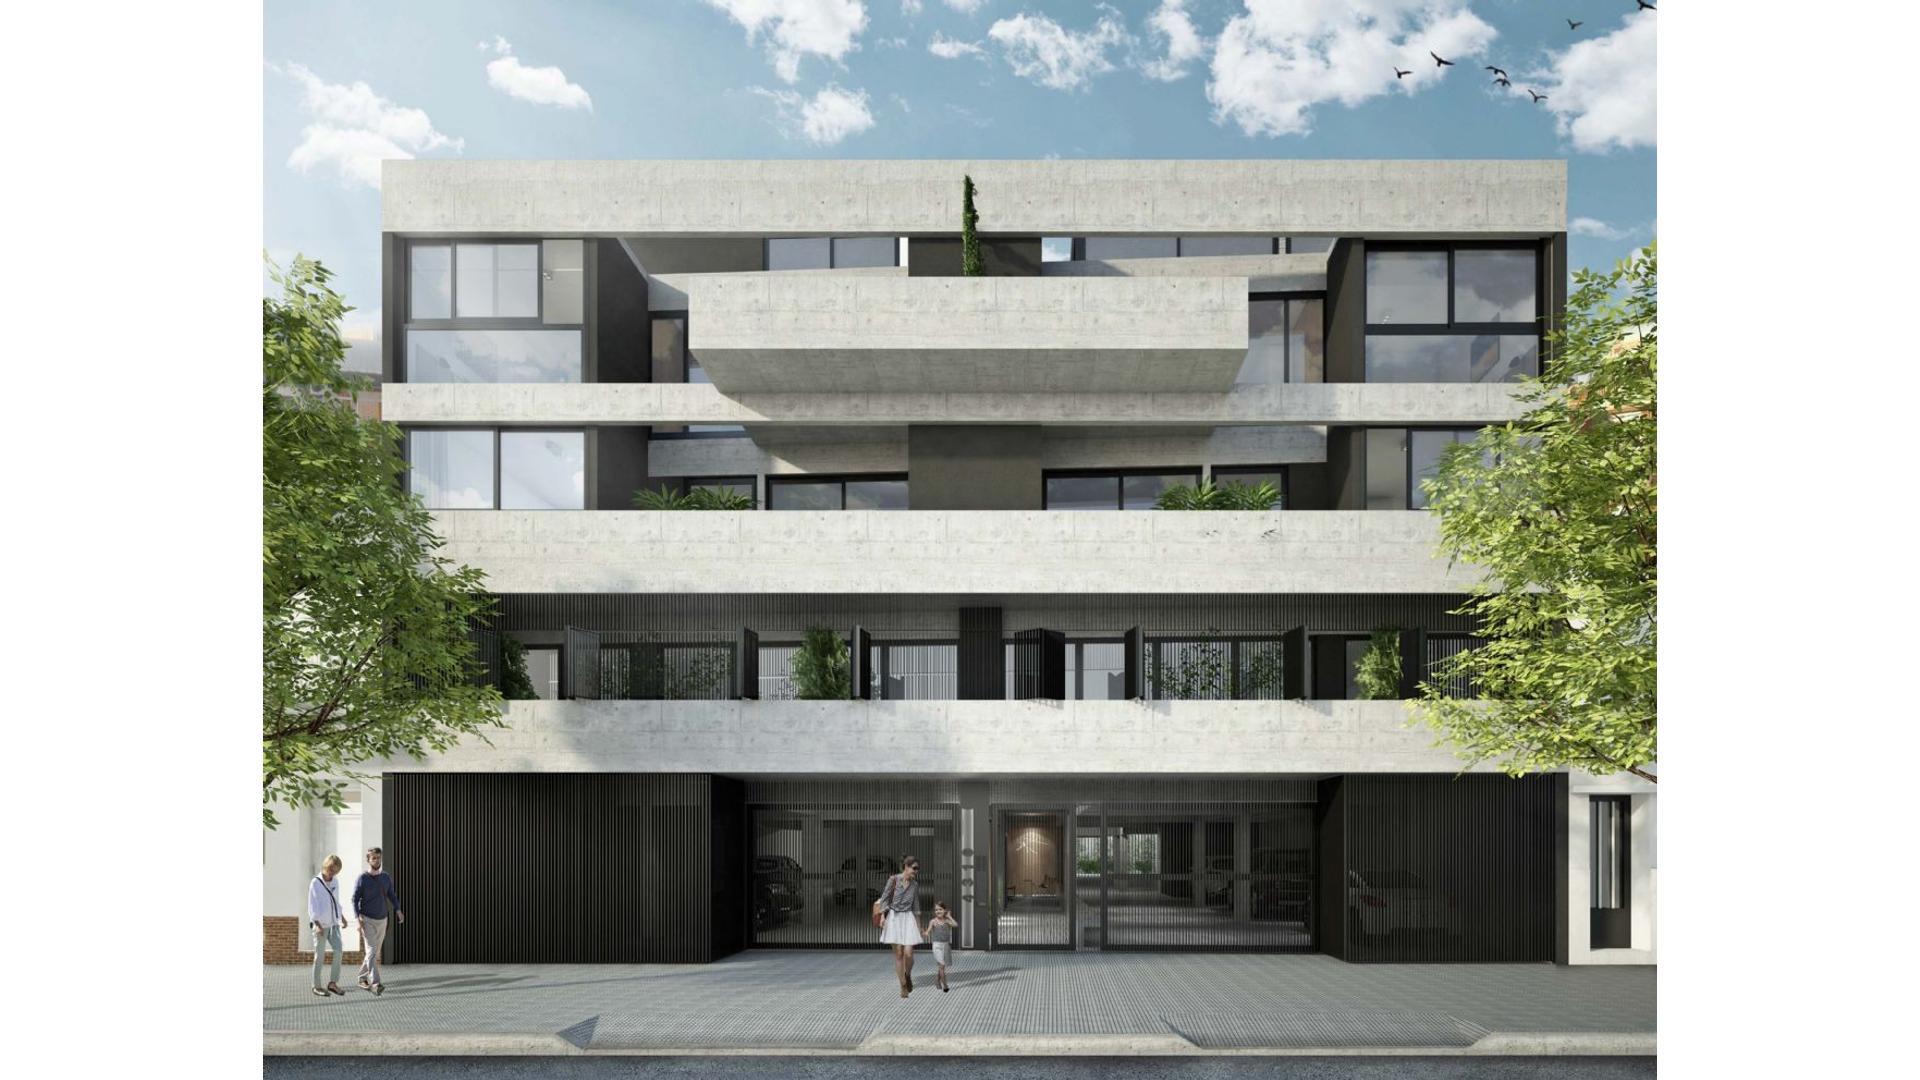 Departamento Duplex  en Venta ubicado en Núñez, Capital Federal - NUN2996_LP122402_1